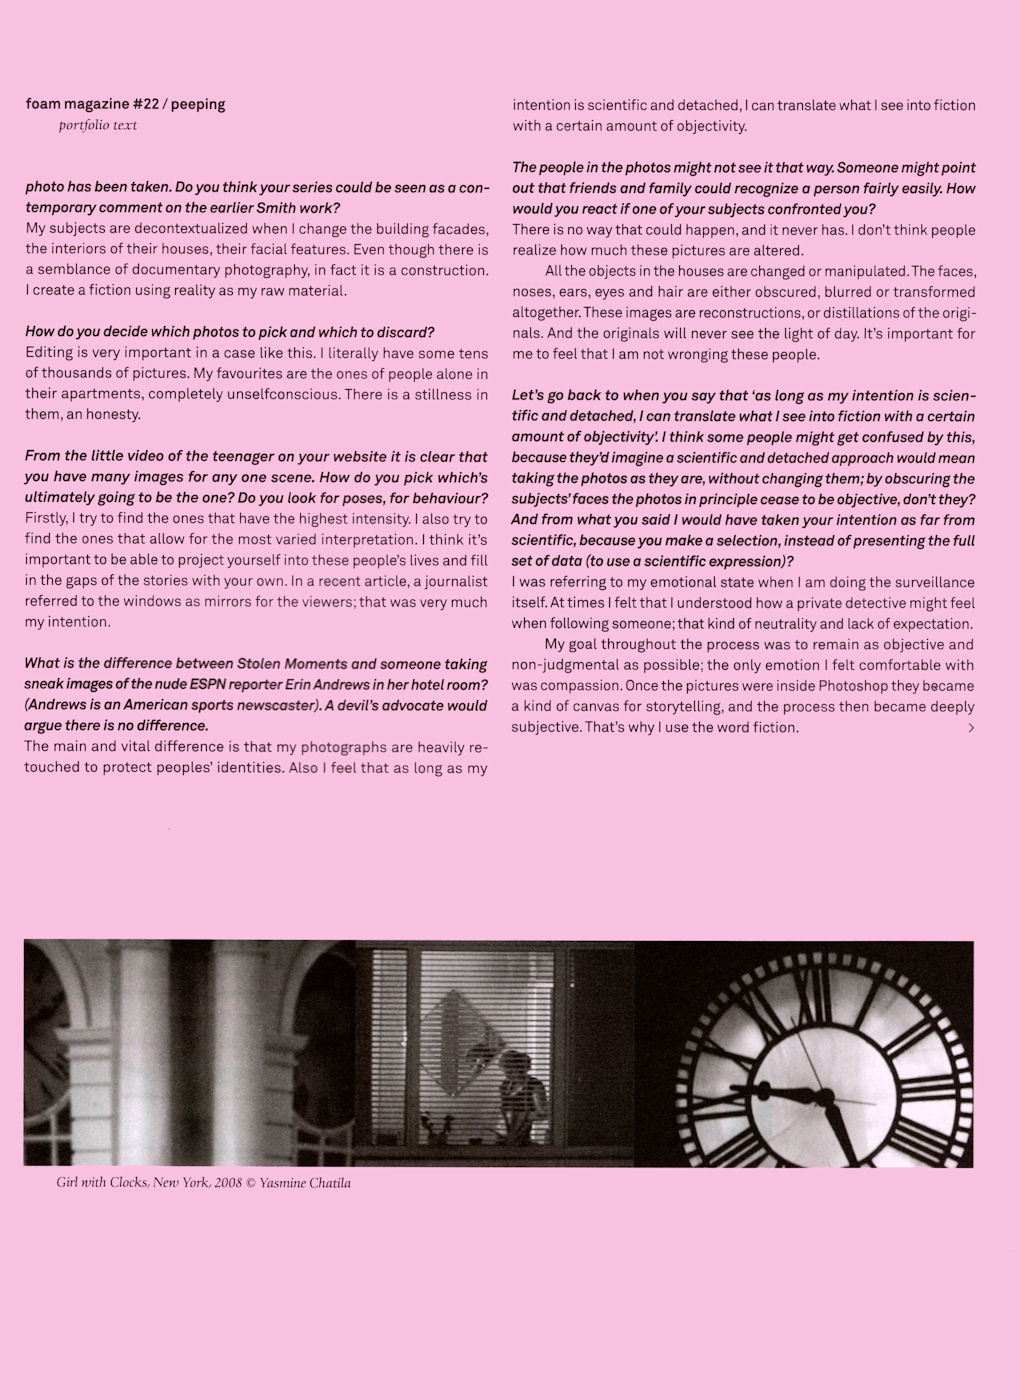 foam-magazine-spring-2010-page-003.jpg